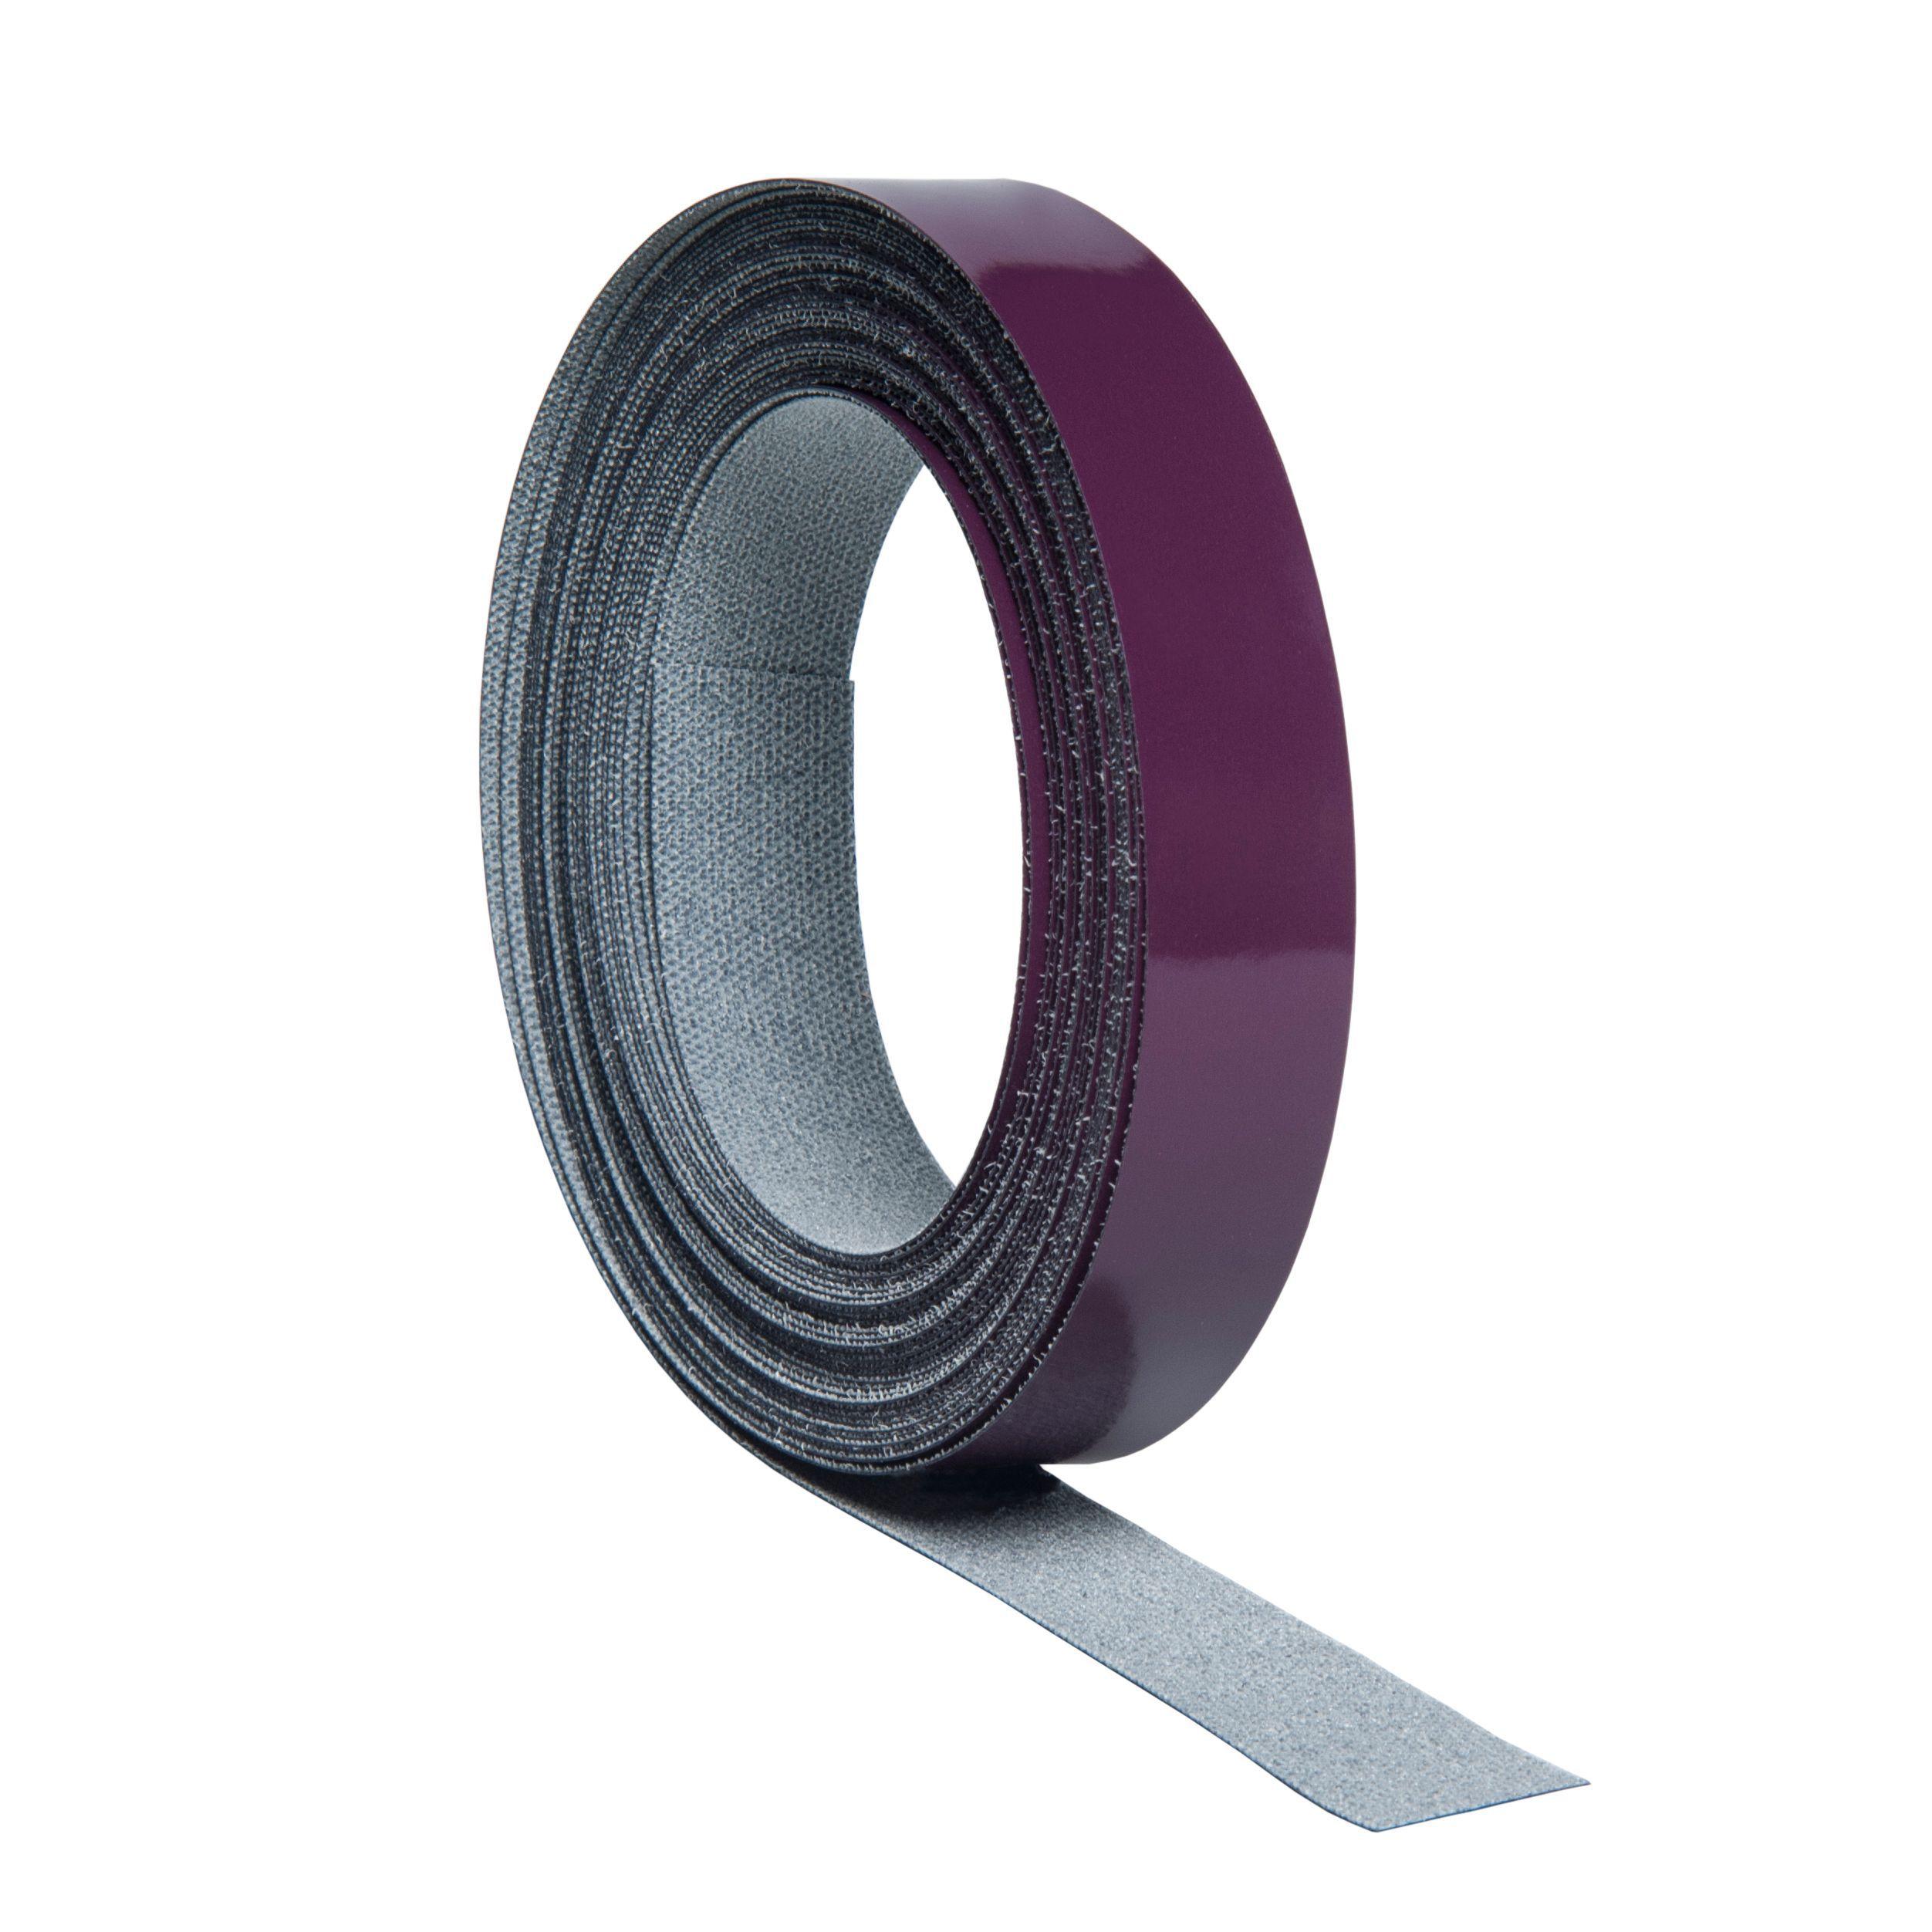 It Kitchens Iron On Edging Tape L 10m Departments Diy